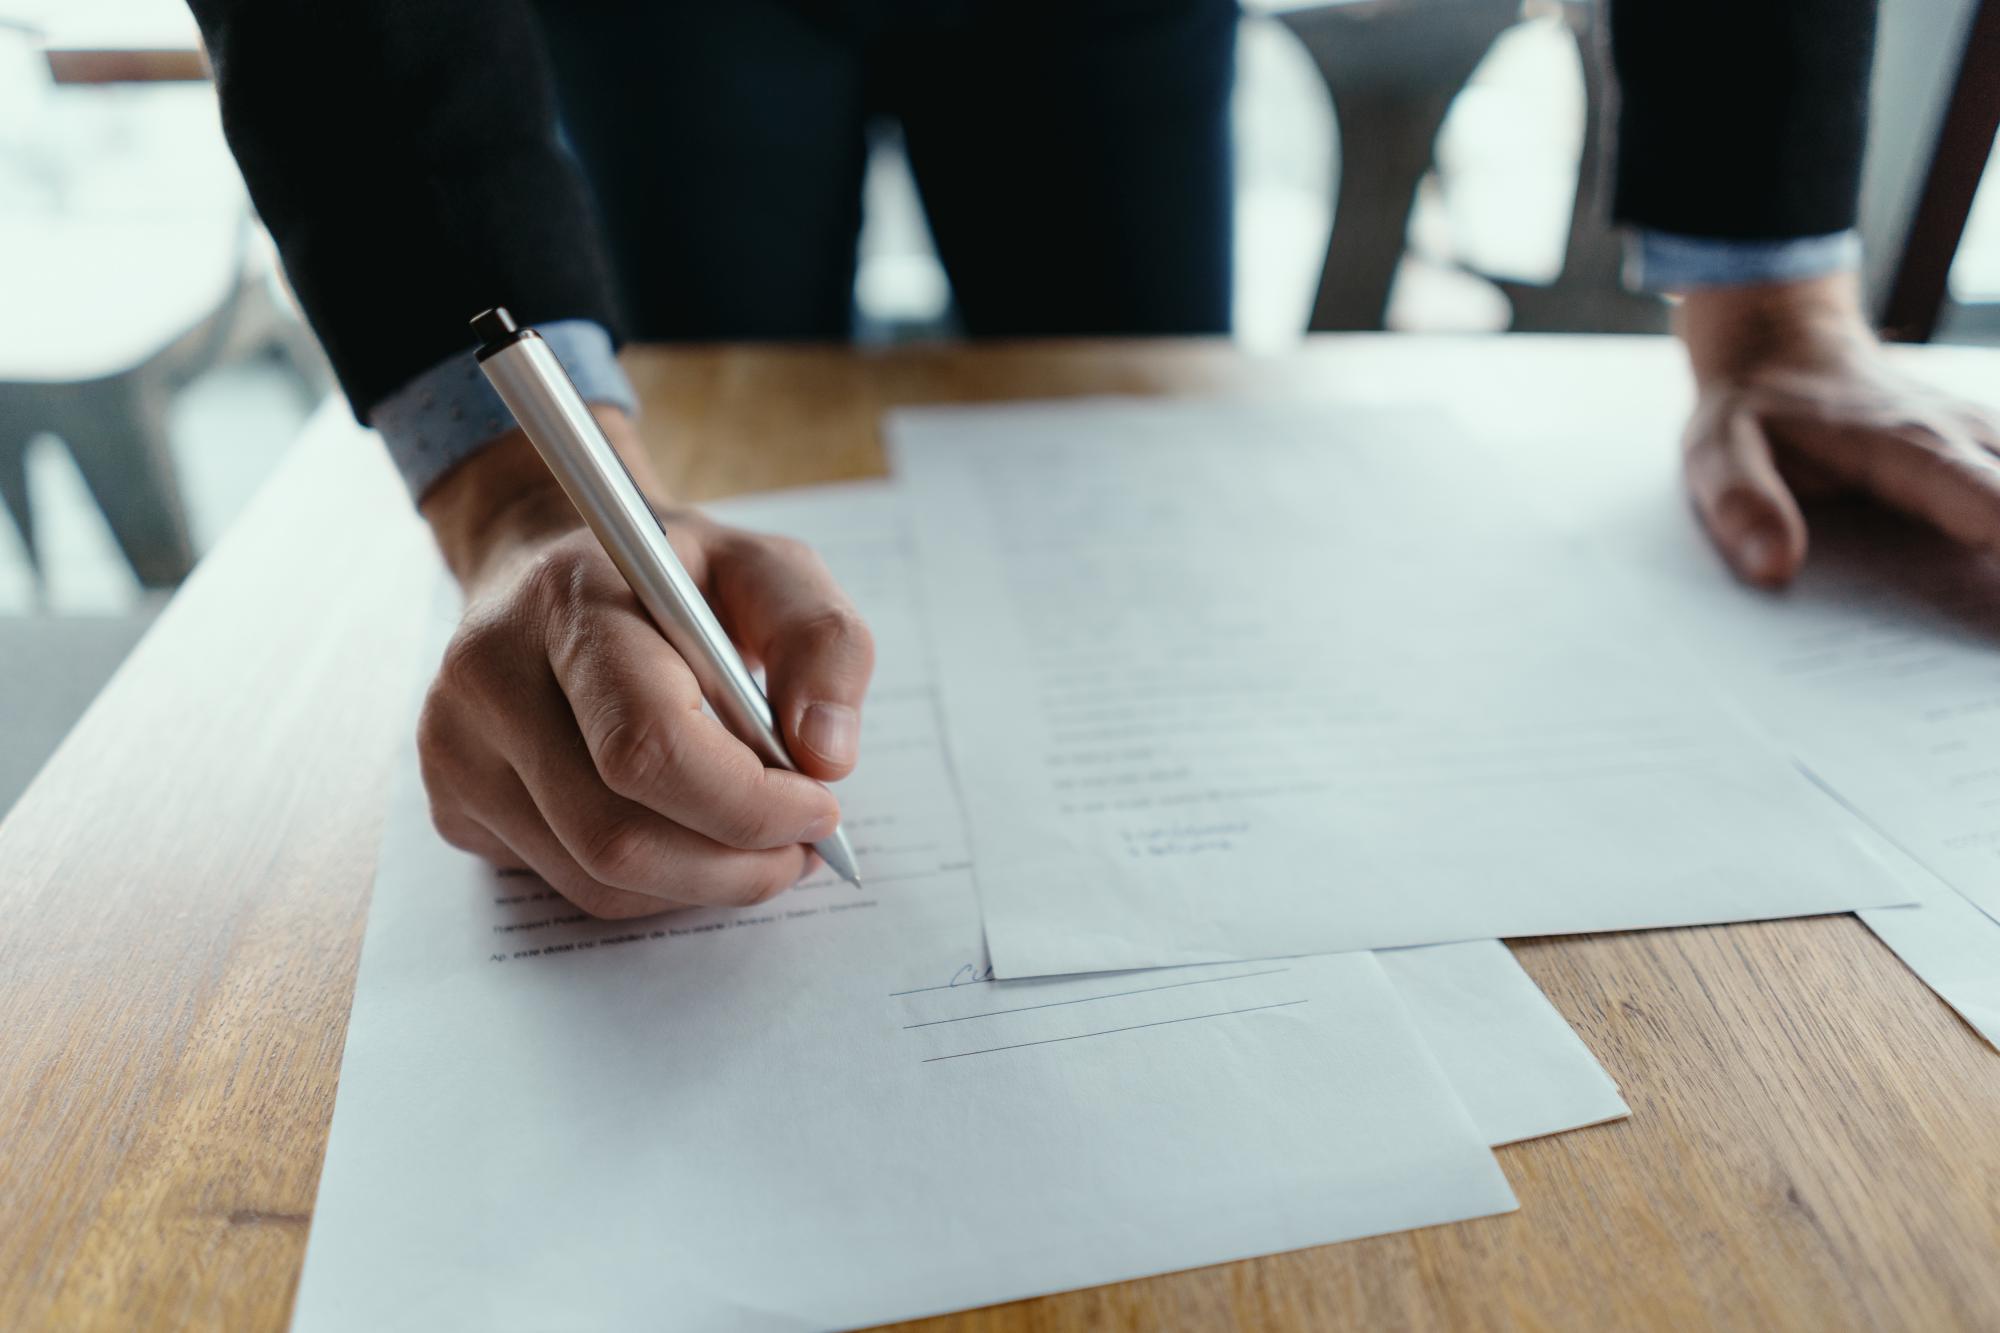 Подготовлен законопроект о ратификации протокола с Кипром